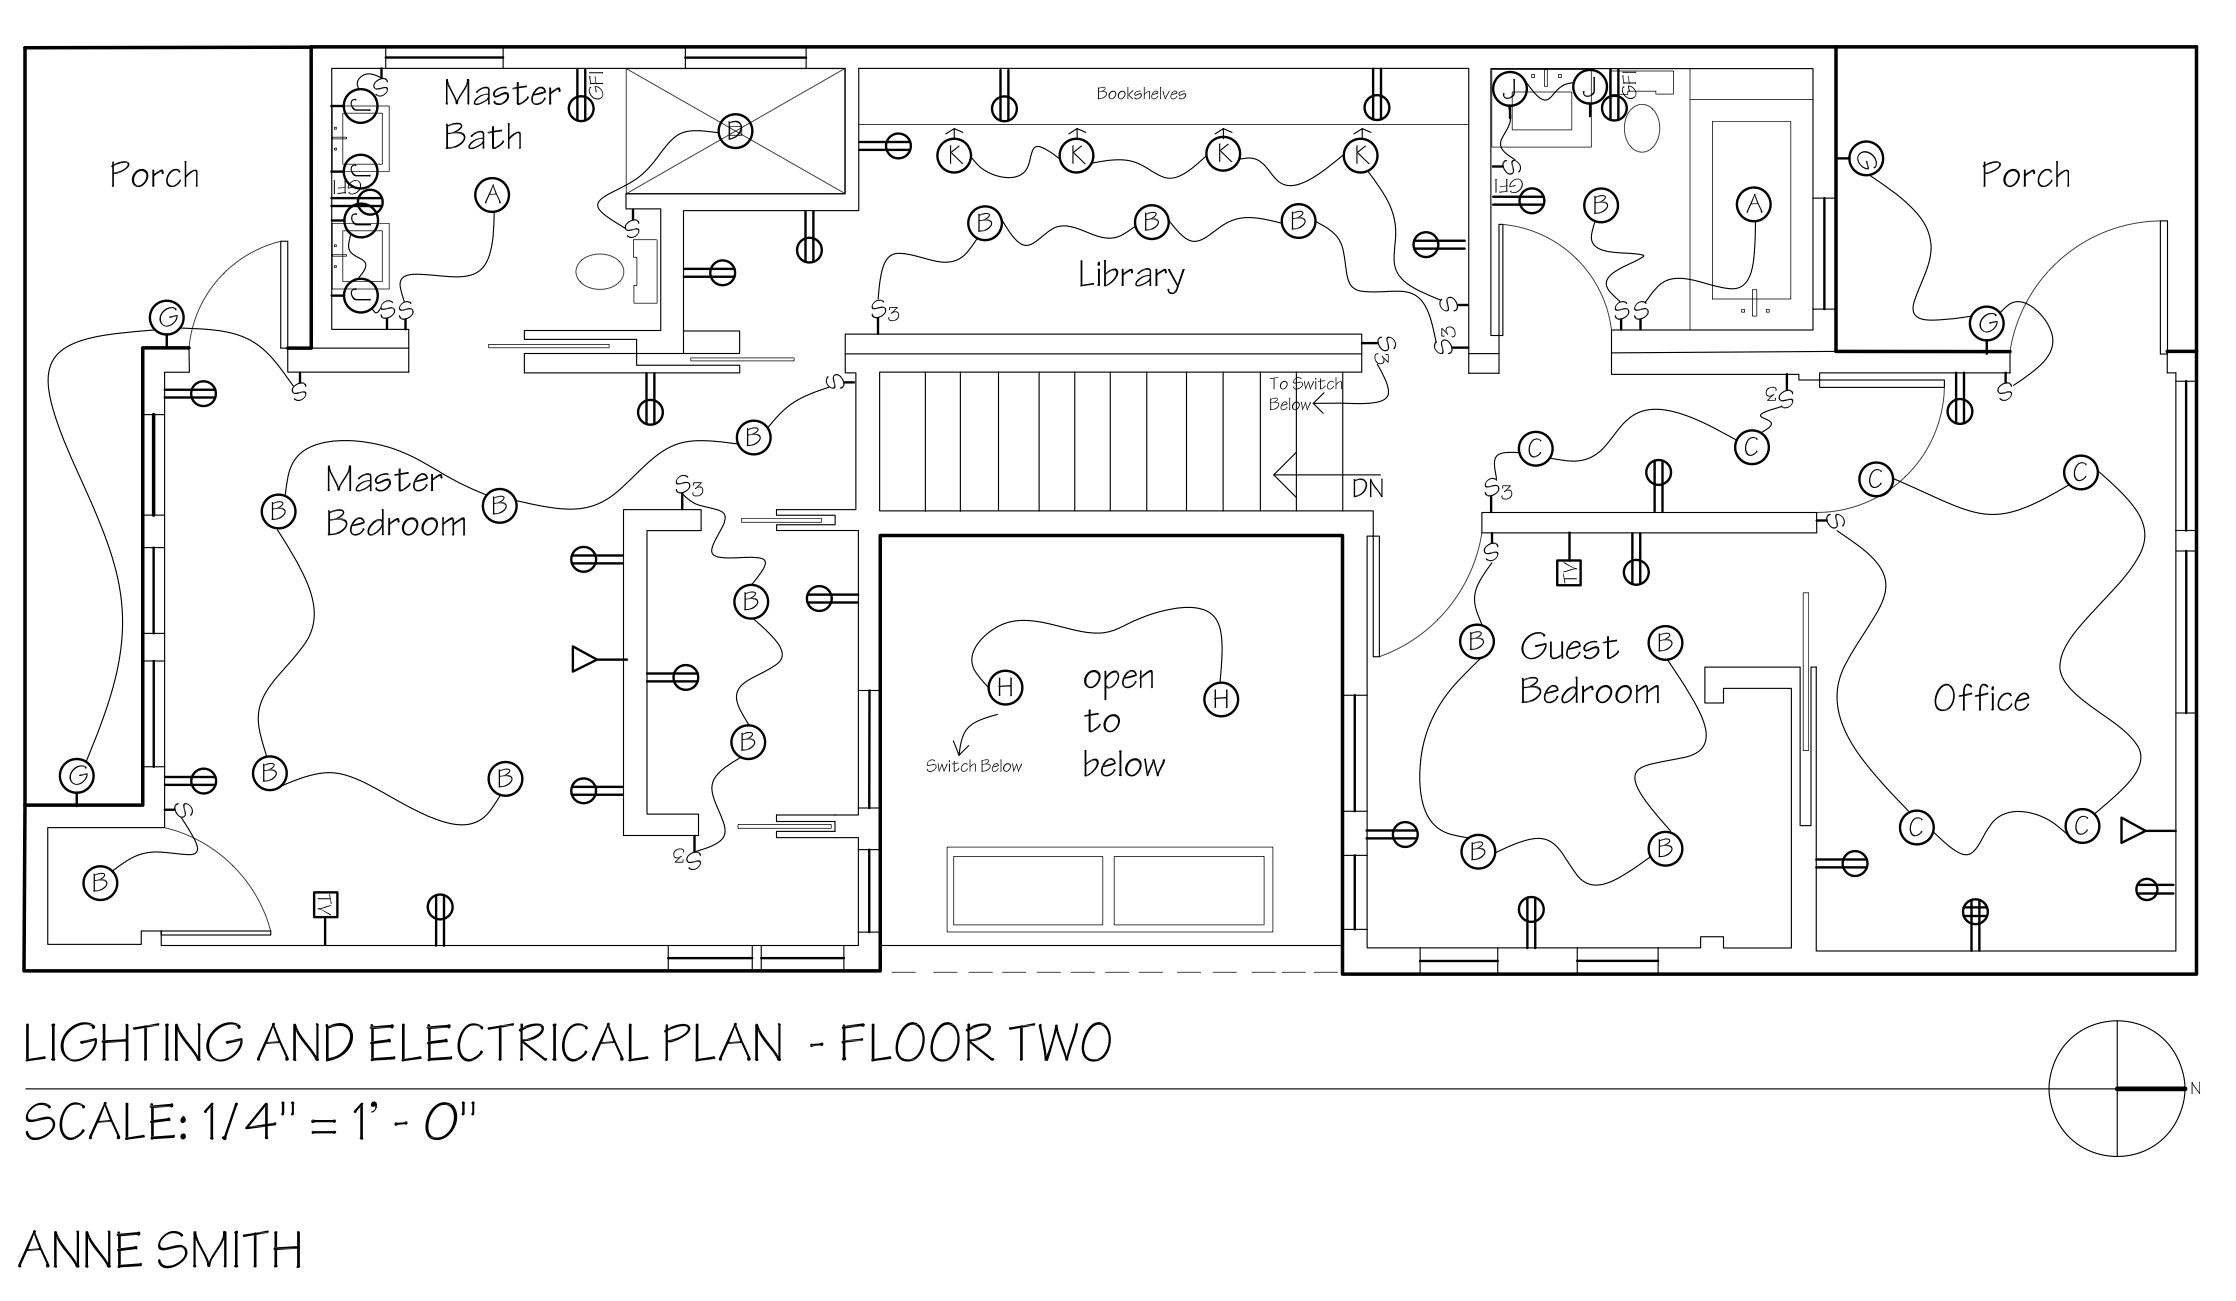 hight resolution of image result for bedroom lighting floor plan